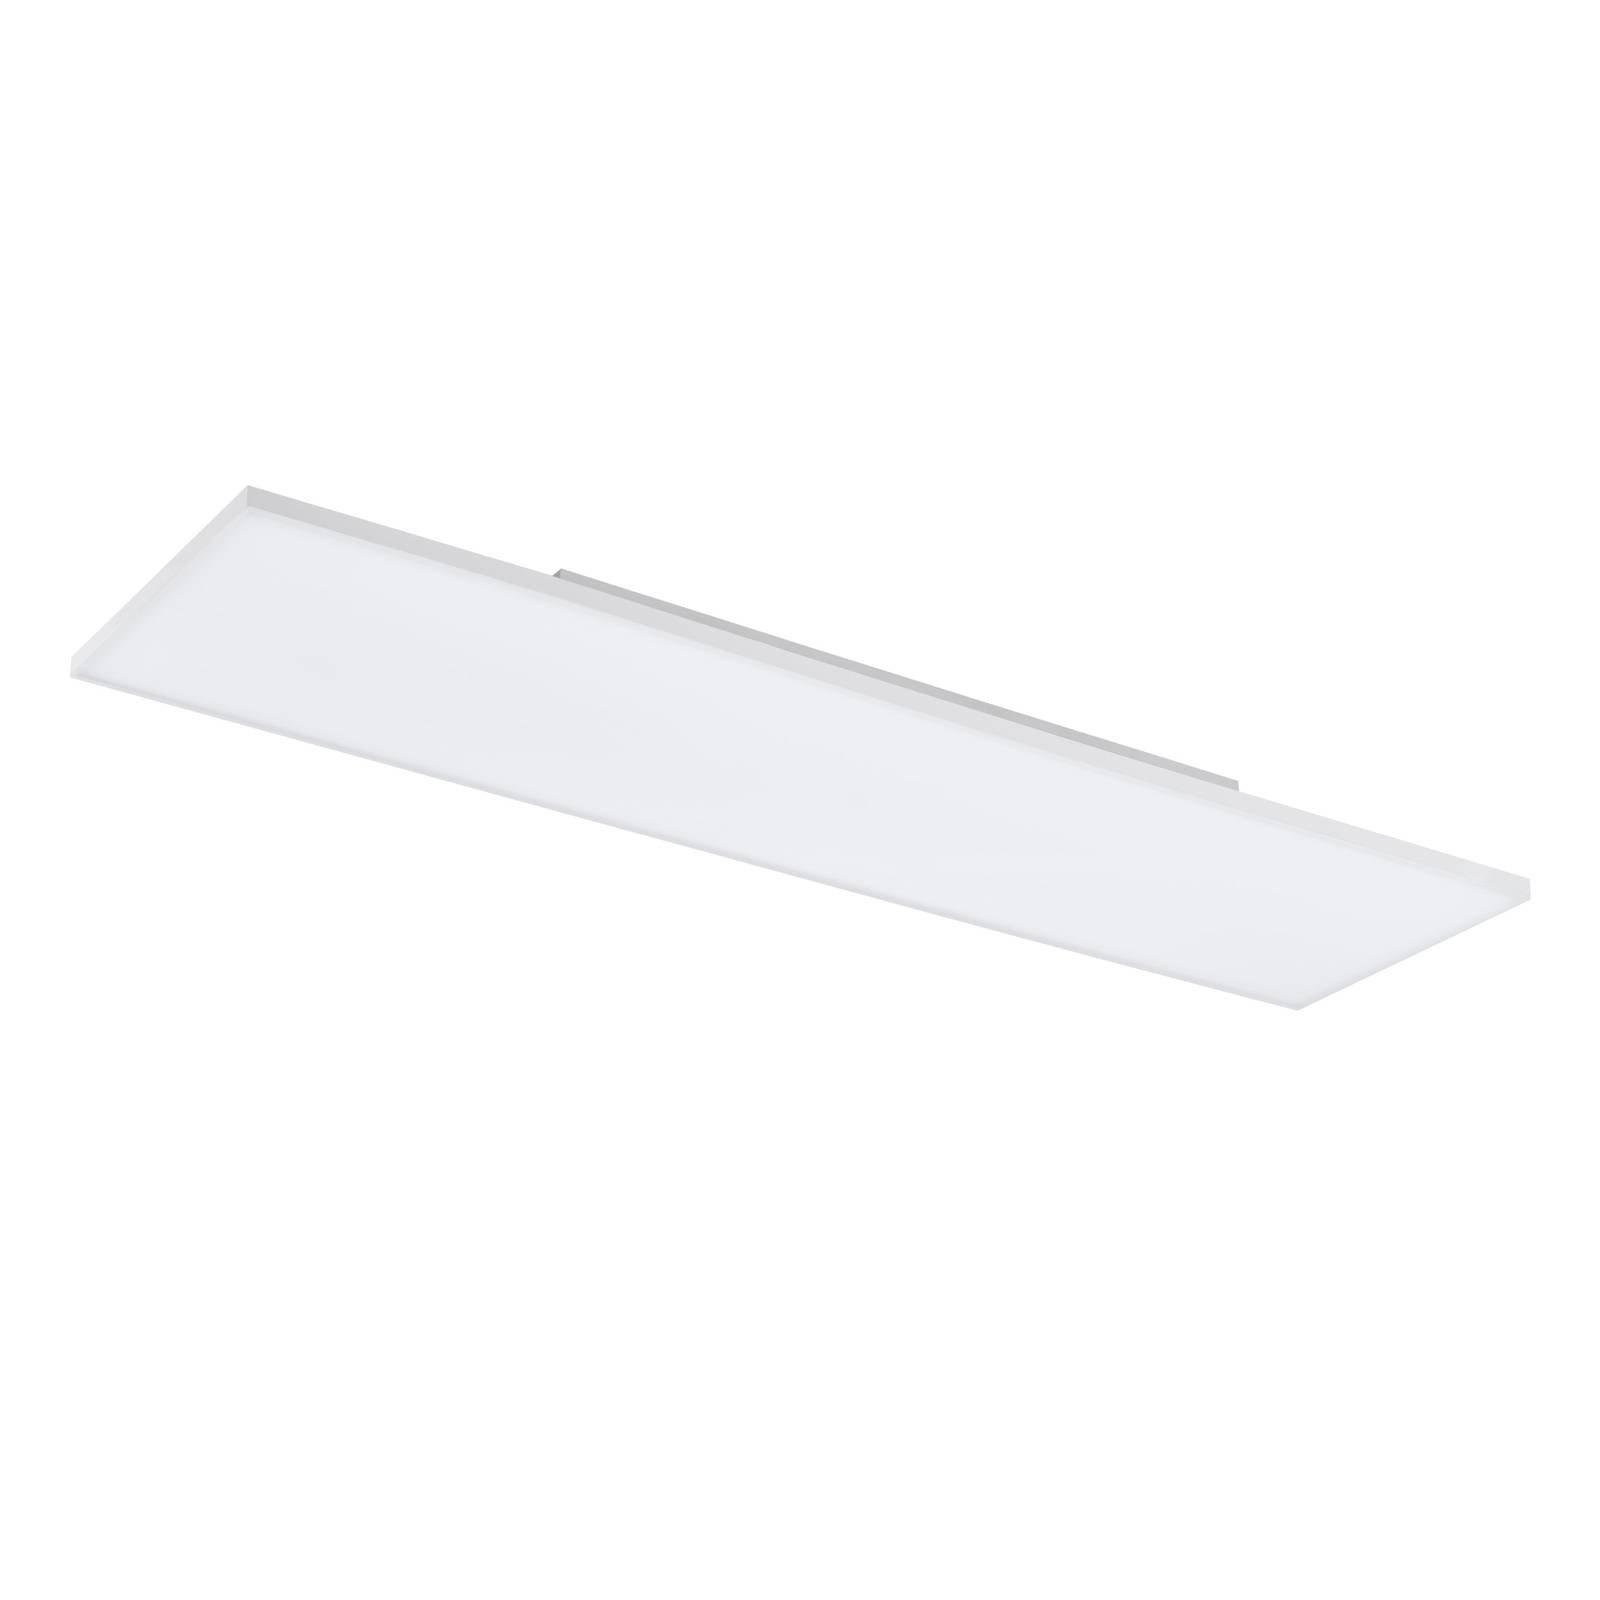 LED-taklampe Turcona, 120 x 30 cm